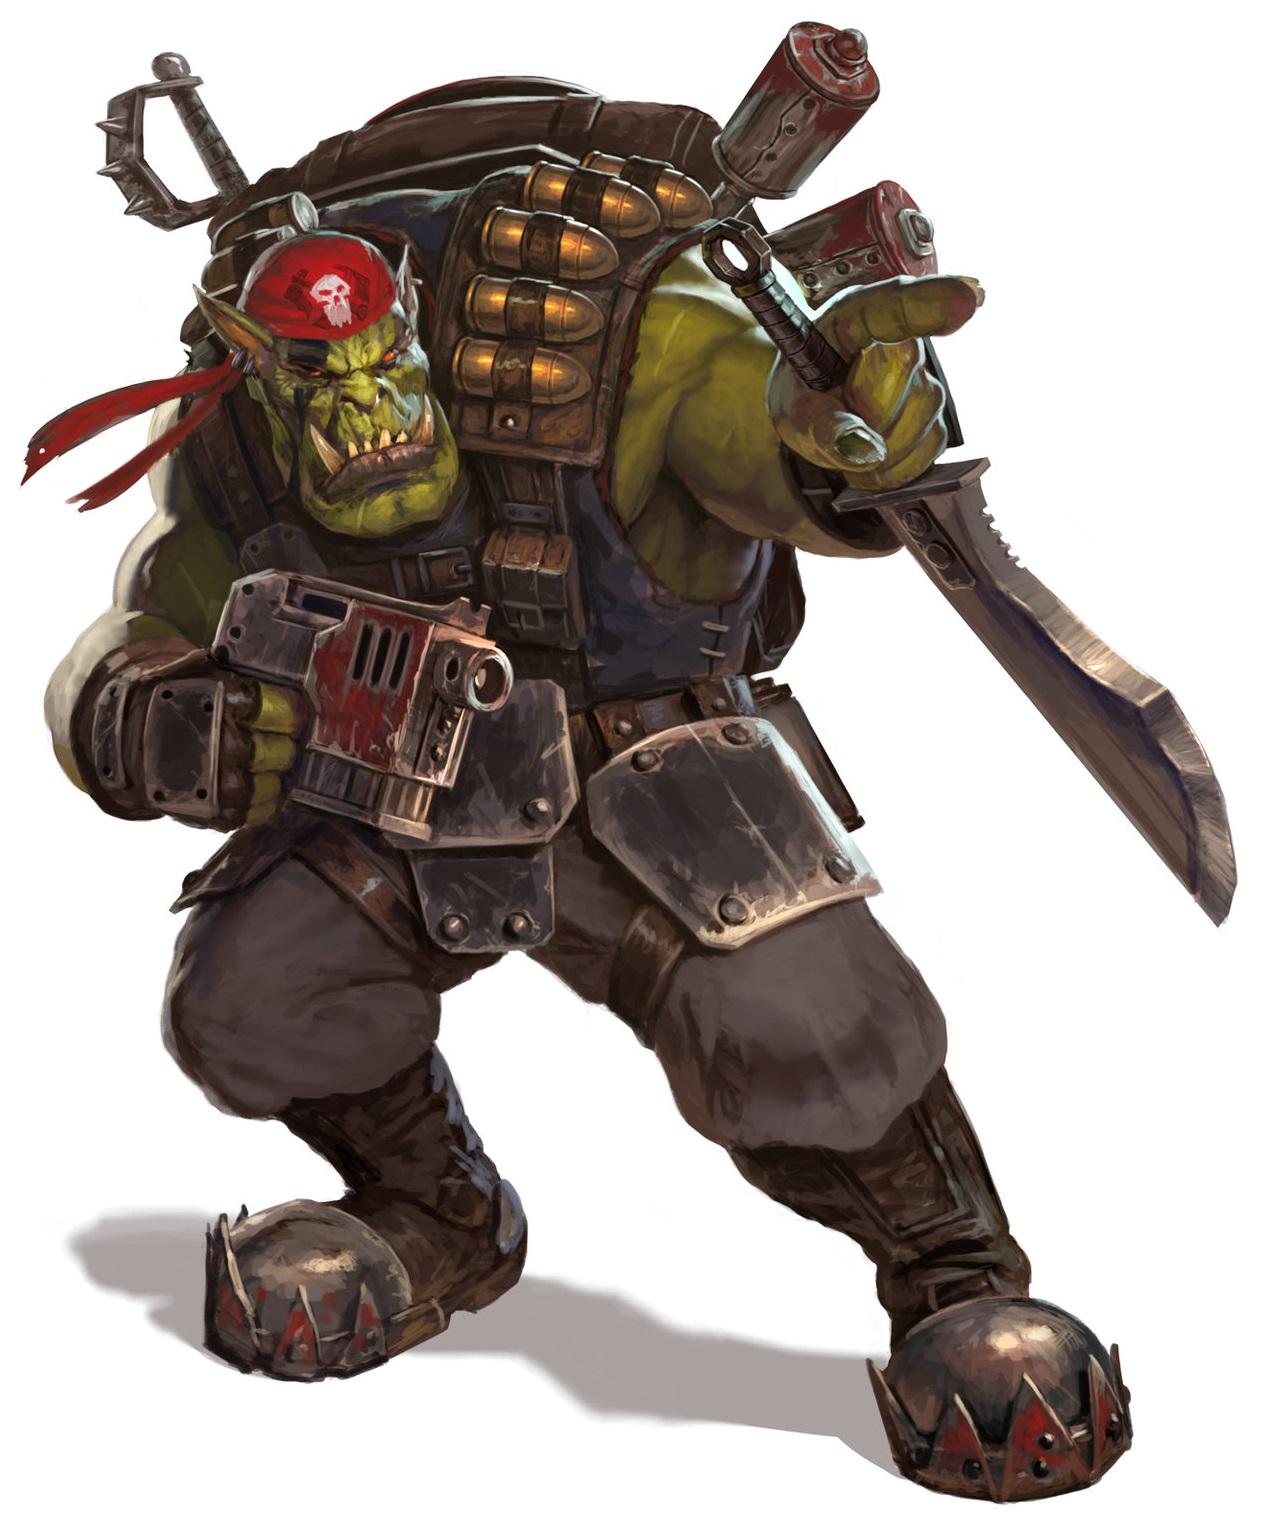 SPARTAN-IIs Run The Ork/Imperial Guard Gauntlet